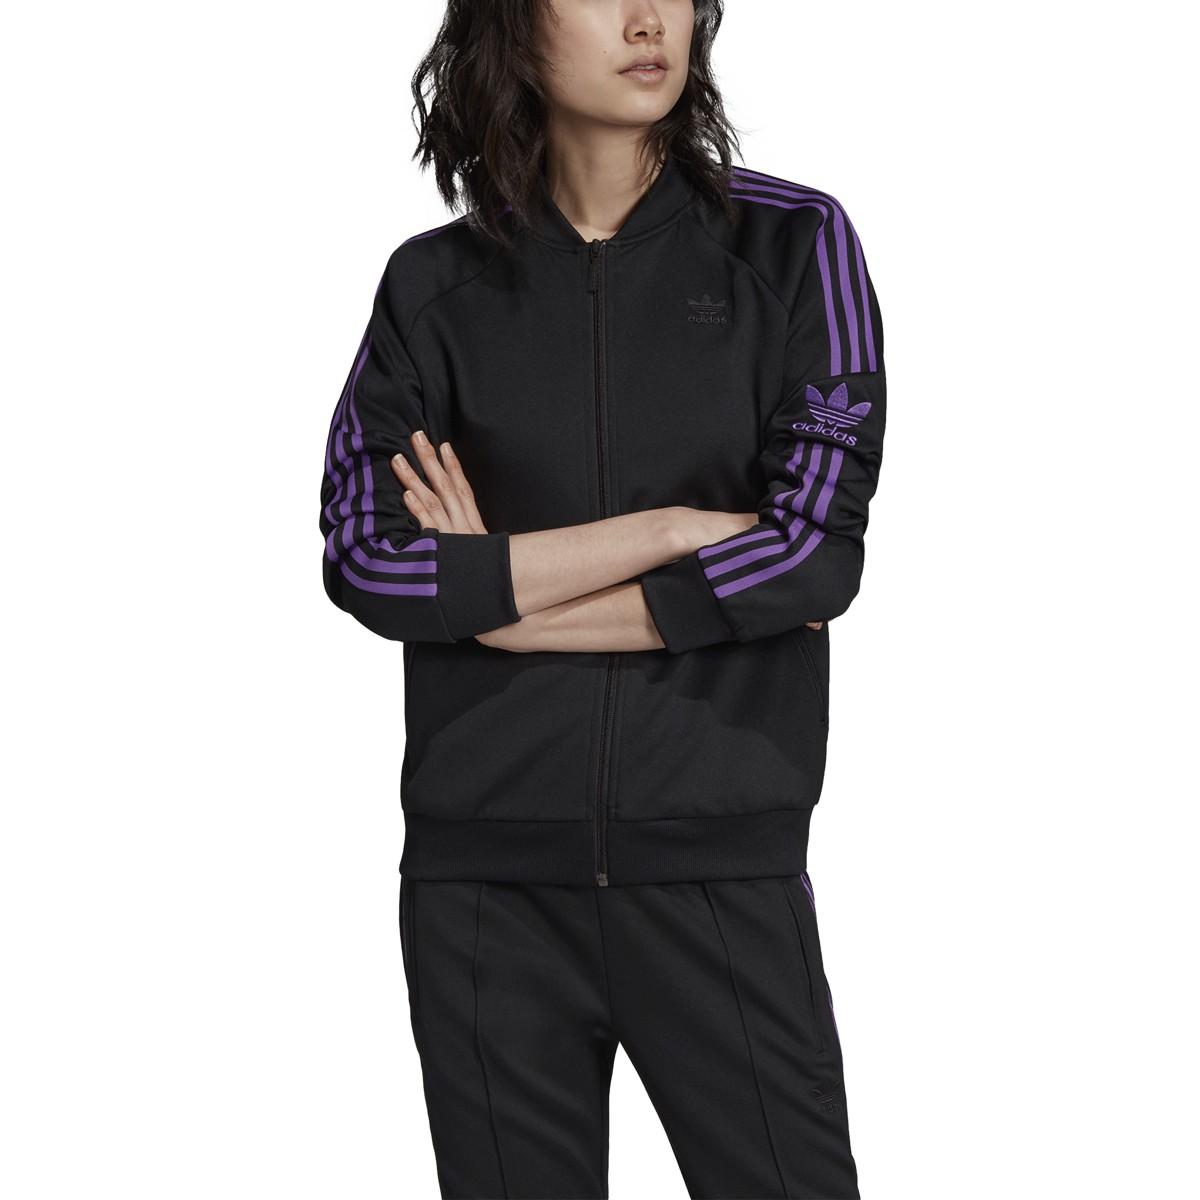 cielo Acercarse Doctrina  Adidas Originals Superstar Womens Track Jacket Black dv0132 | eBay